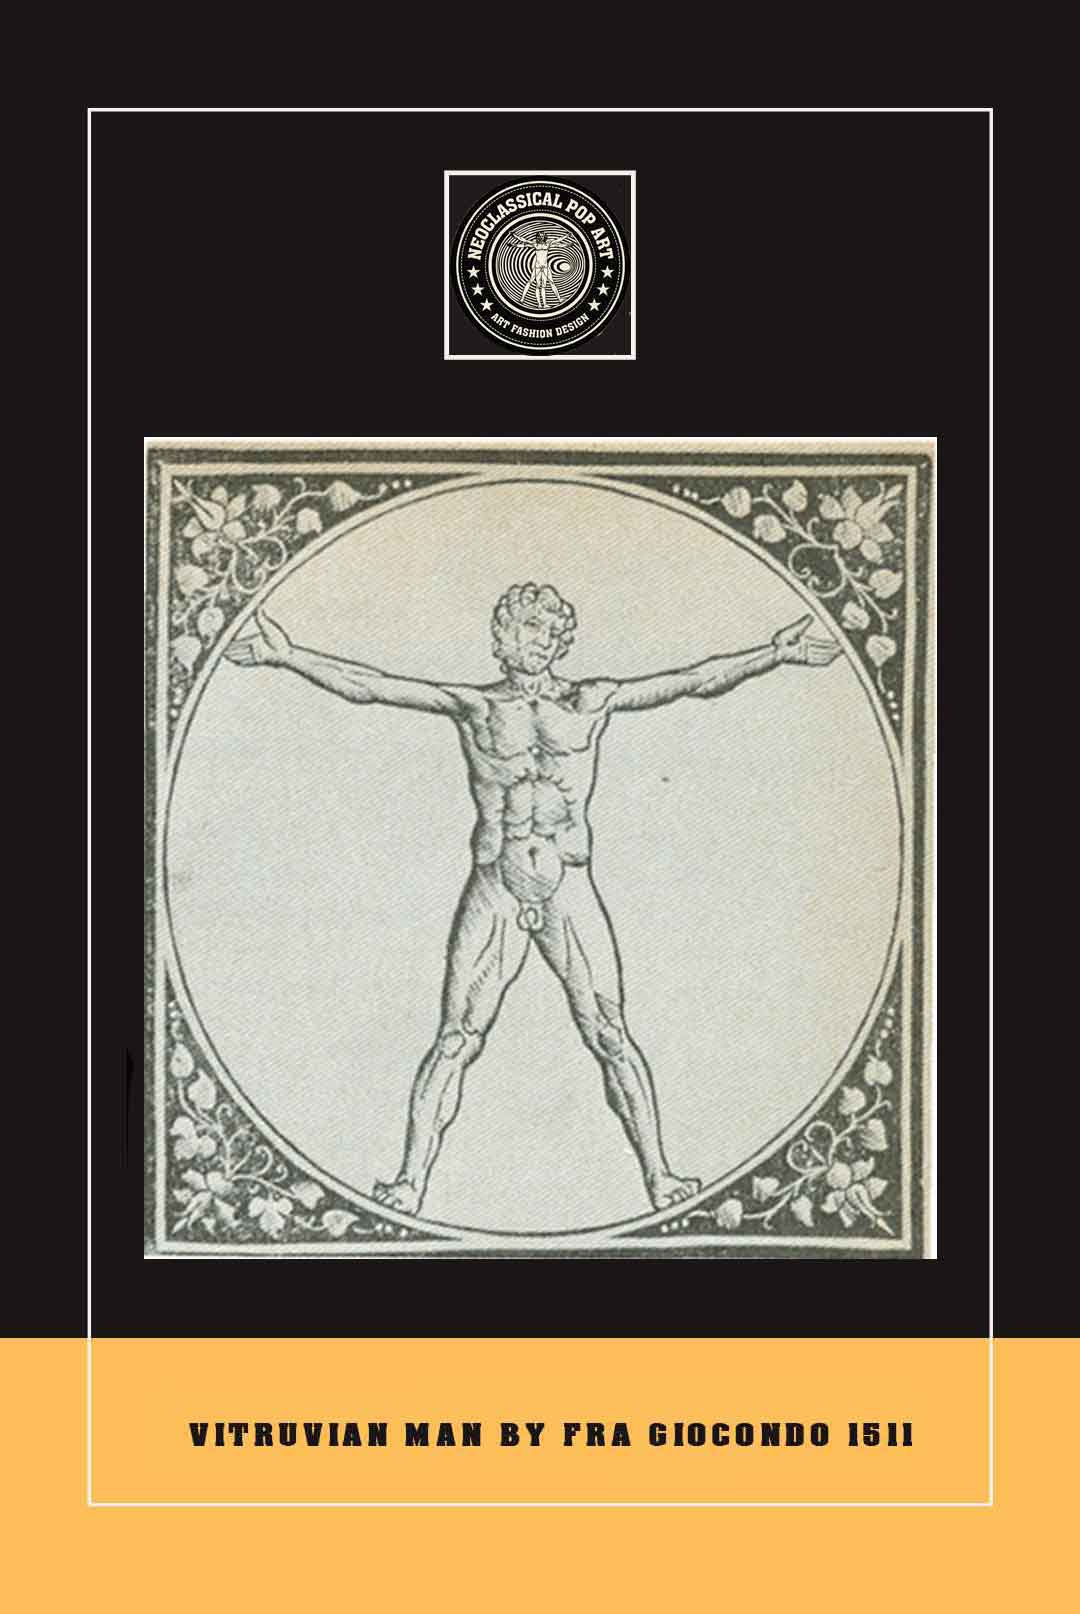 fra-vitruvianman-drawing-logo-study by neoclassical pop art